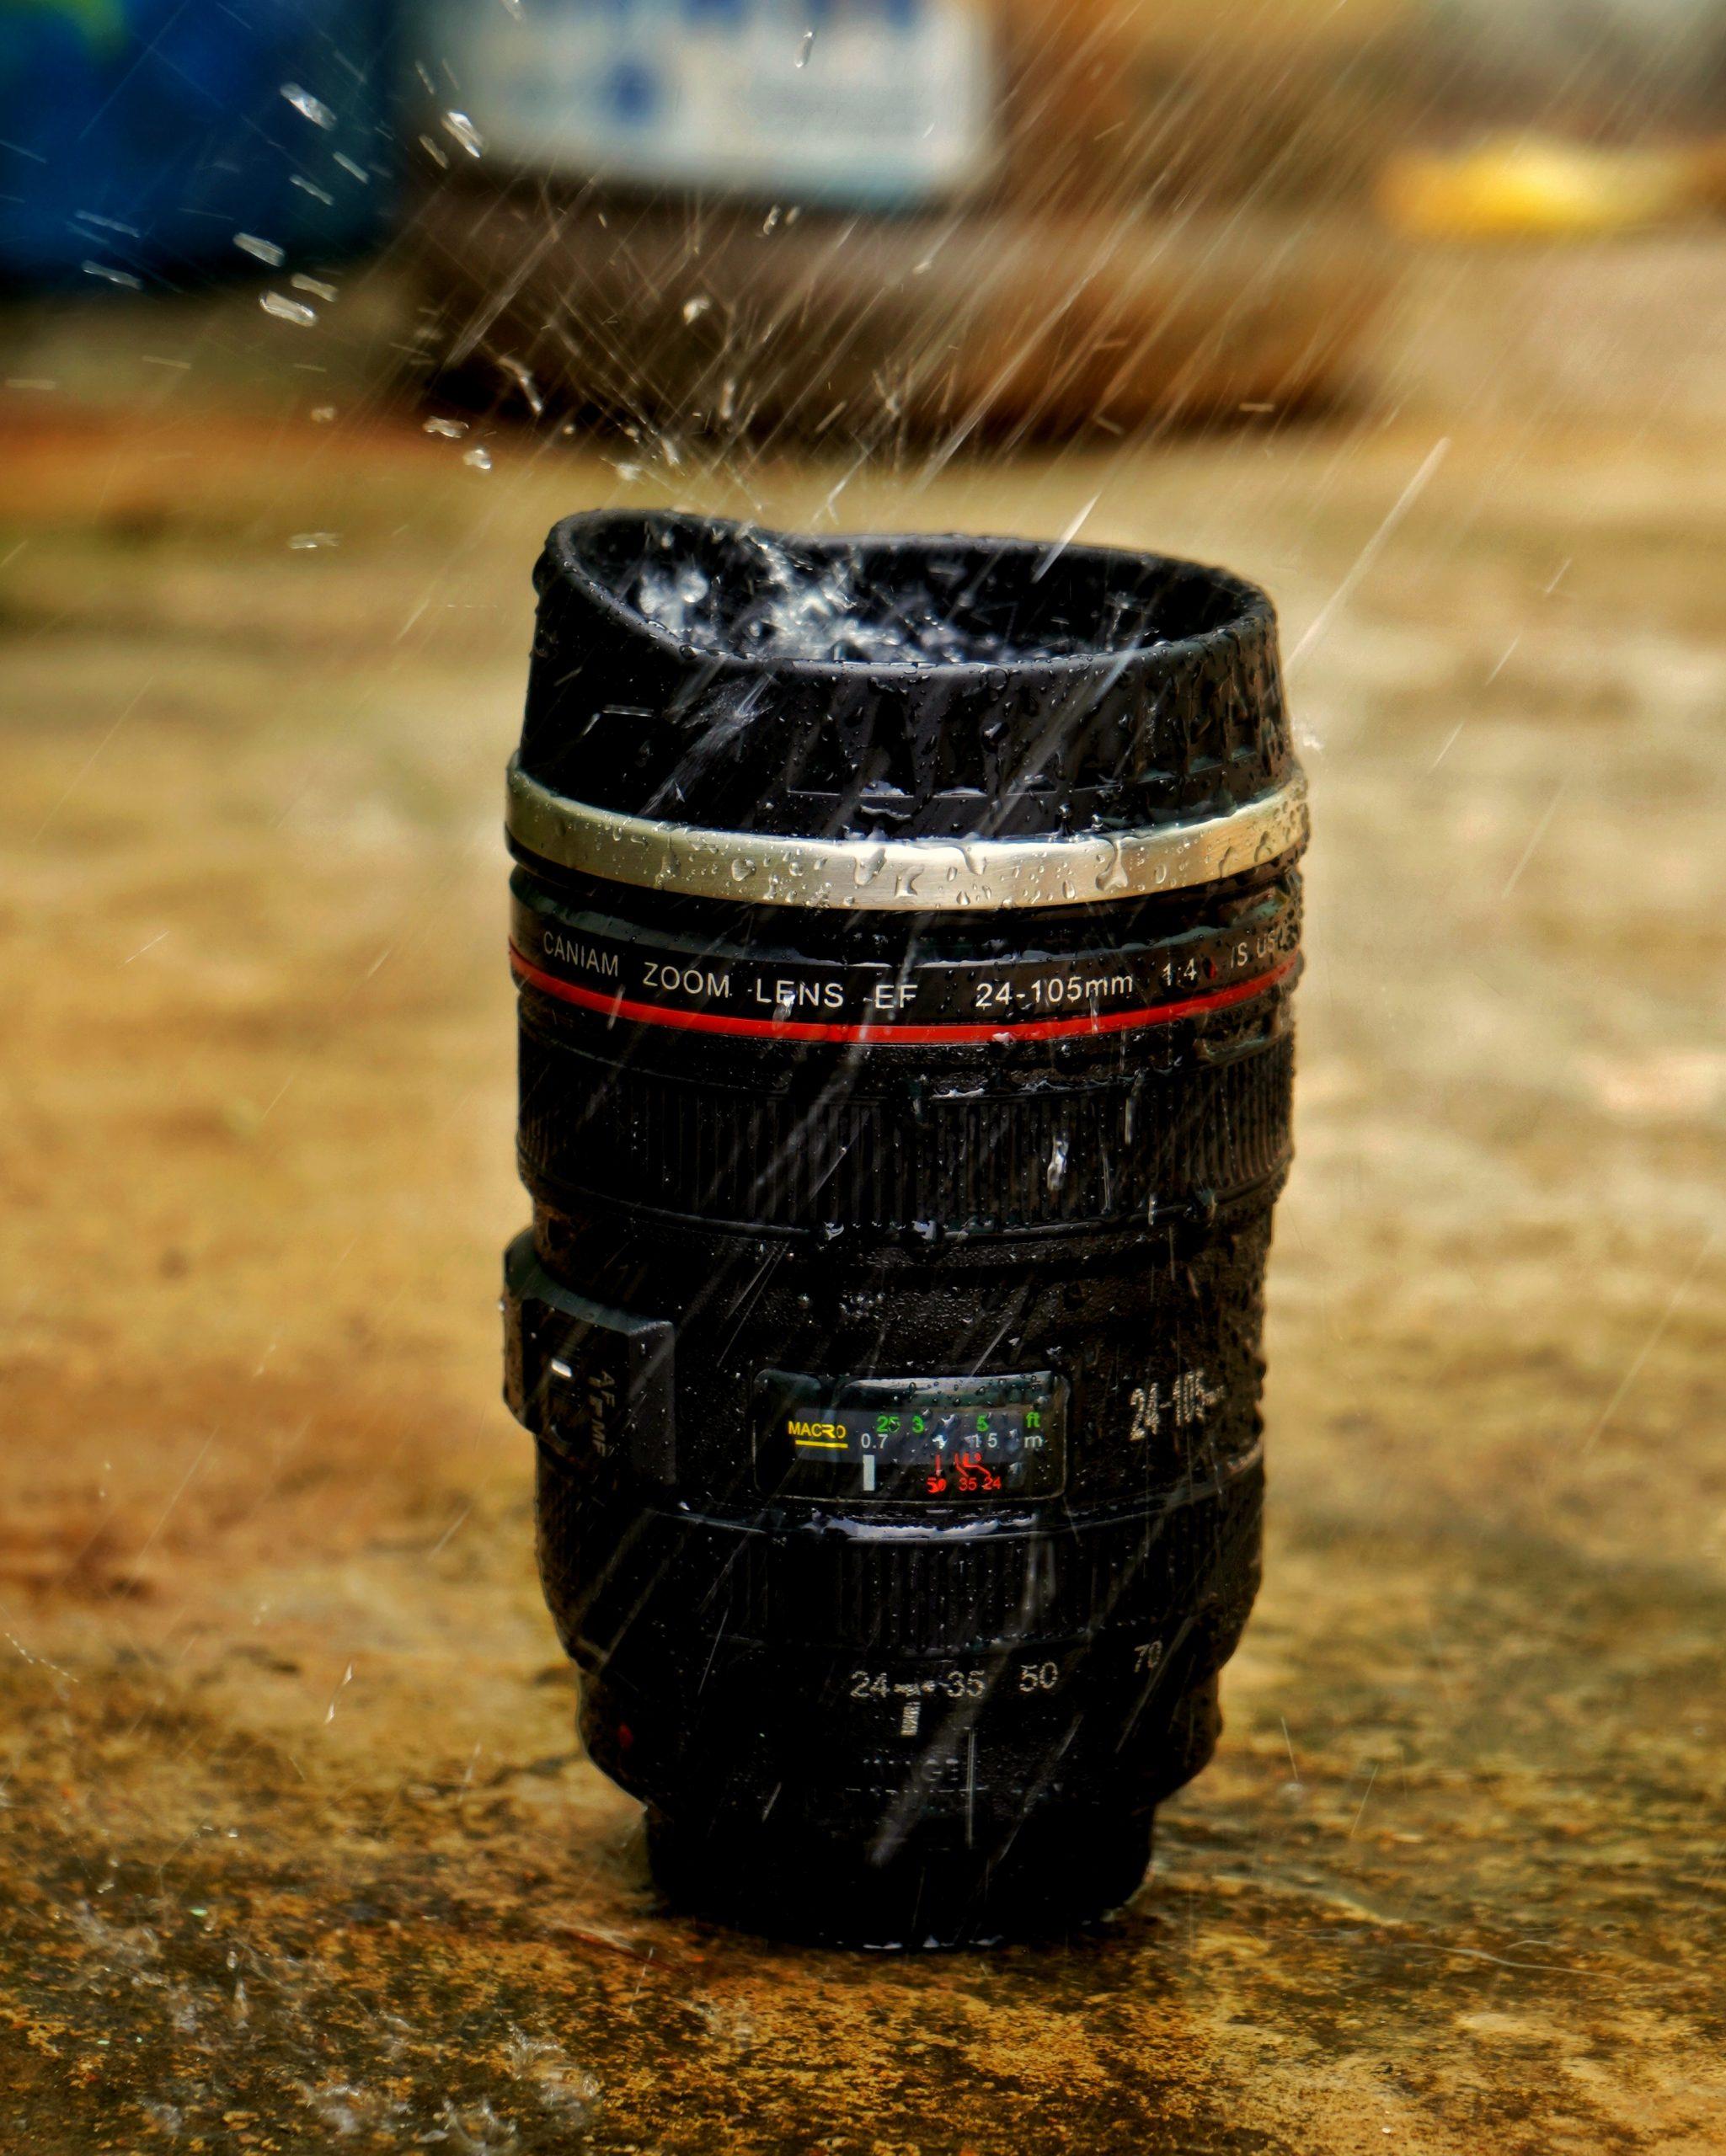 Camera lens in the rain